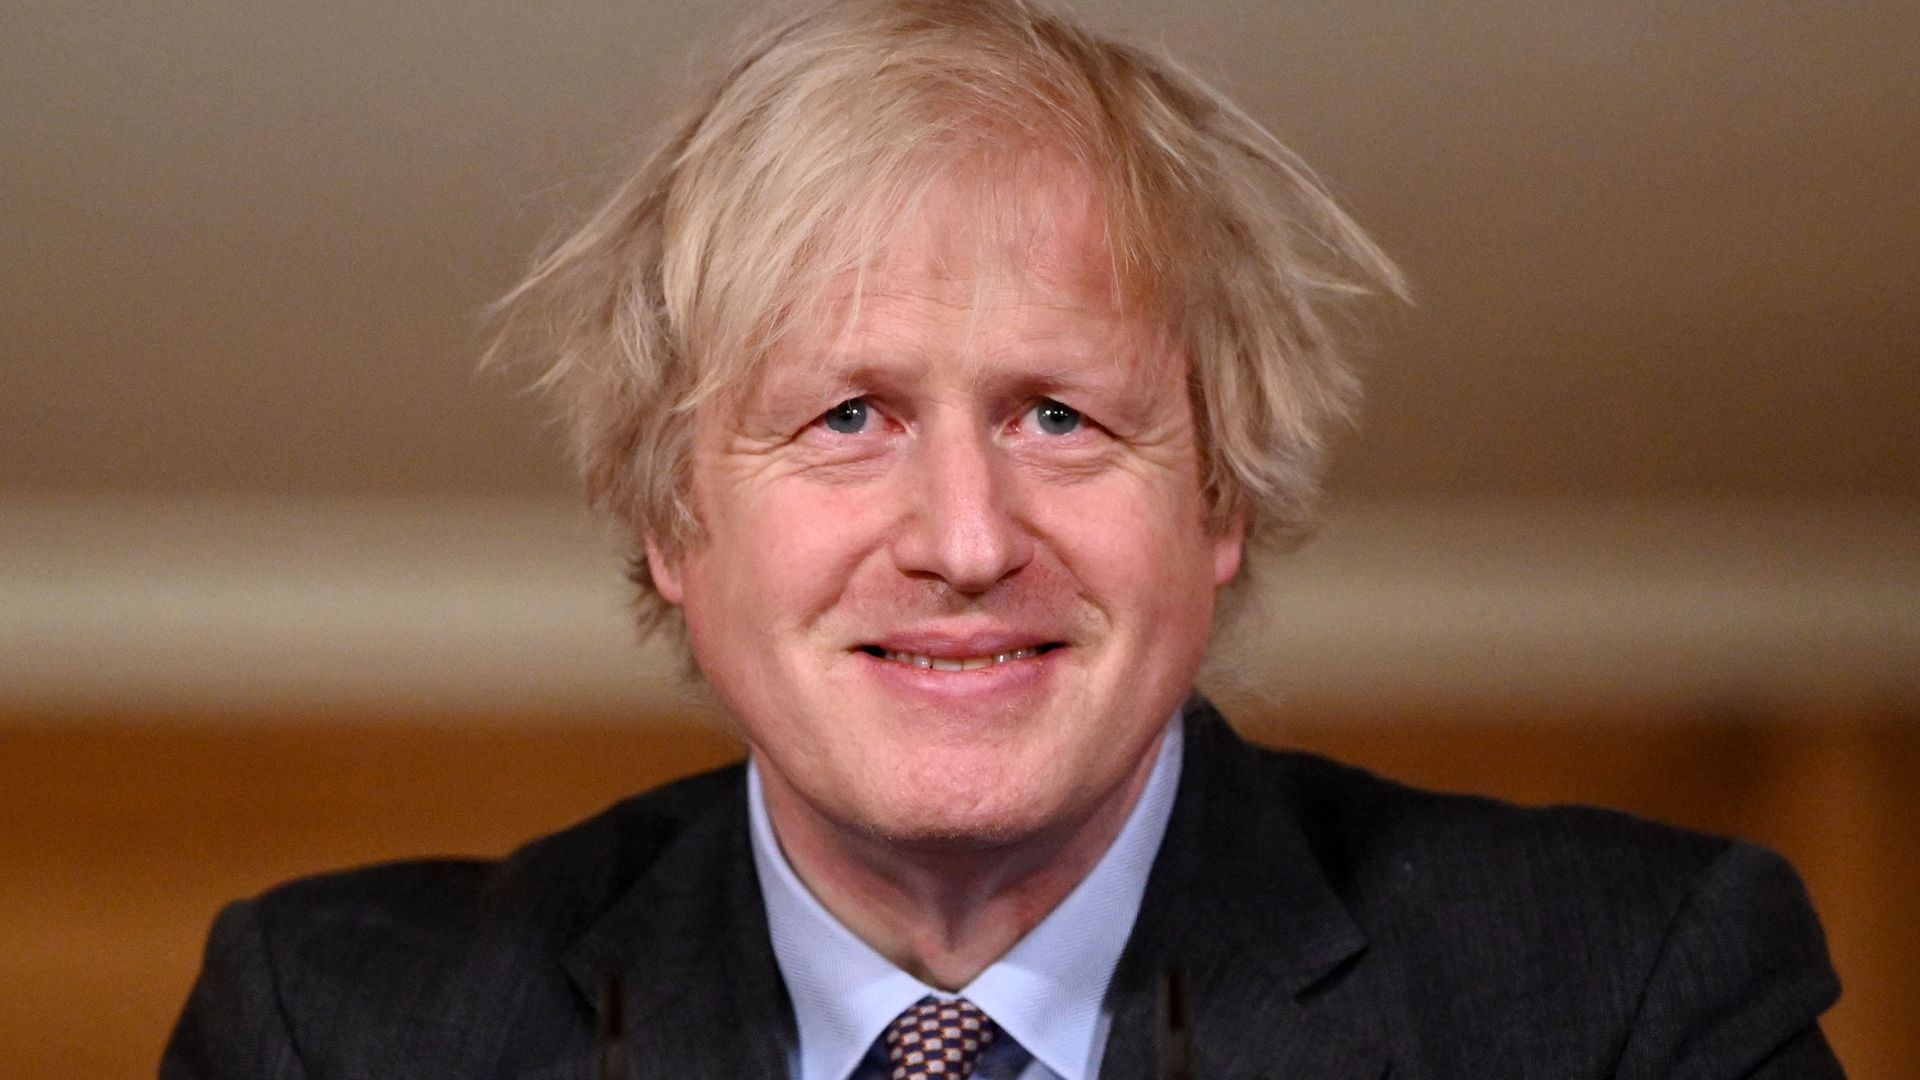 Prime minister Boris Johnson at Downing Street - Credit: PA